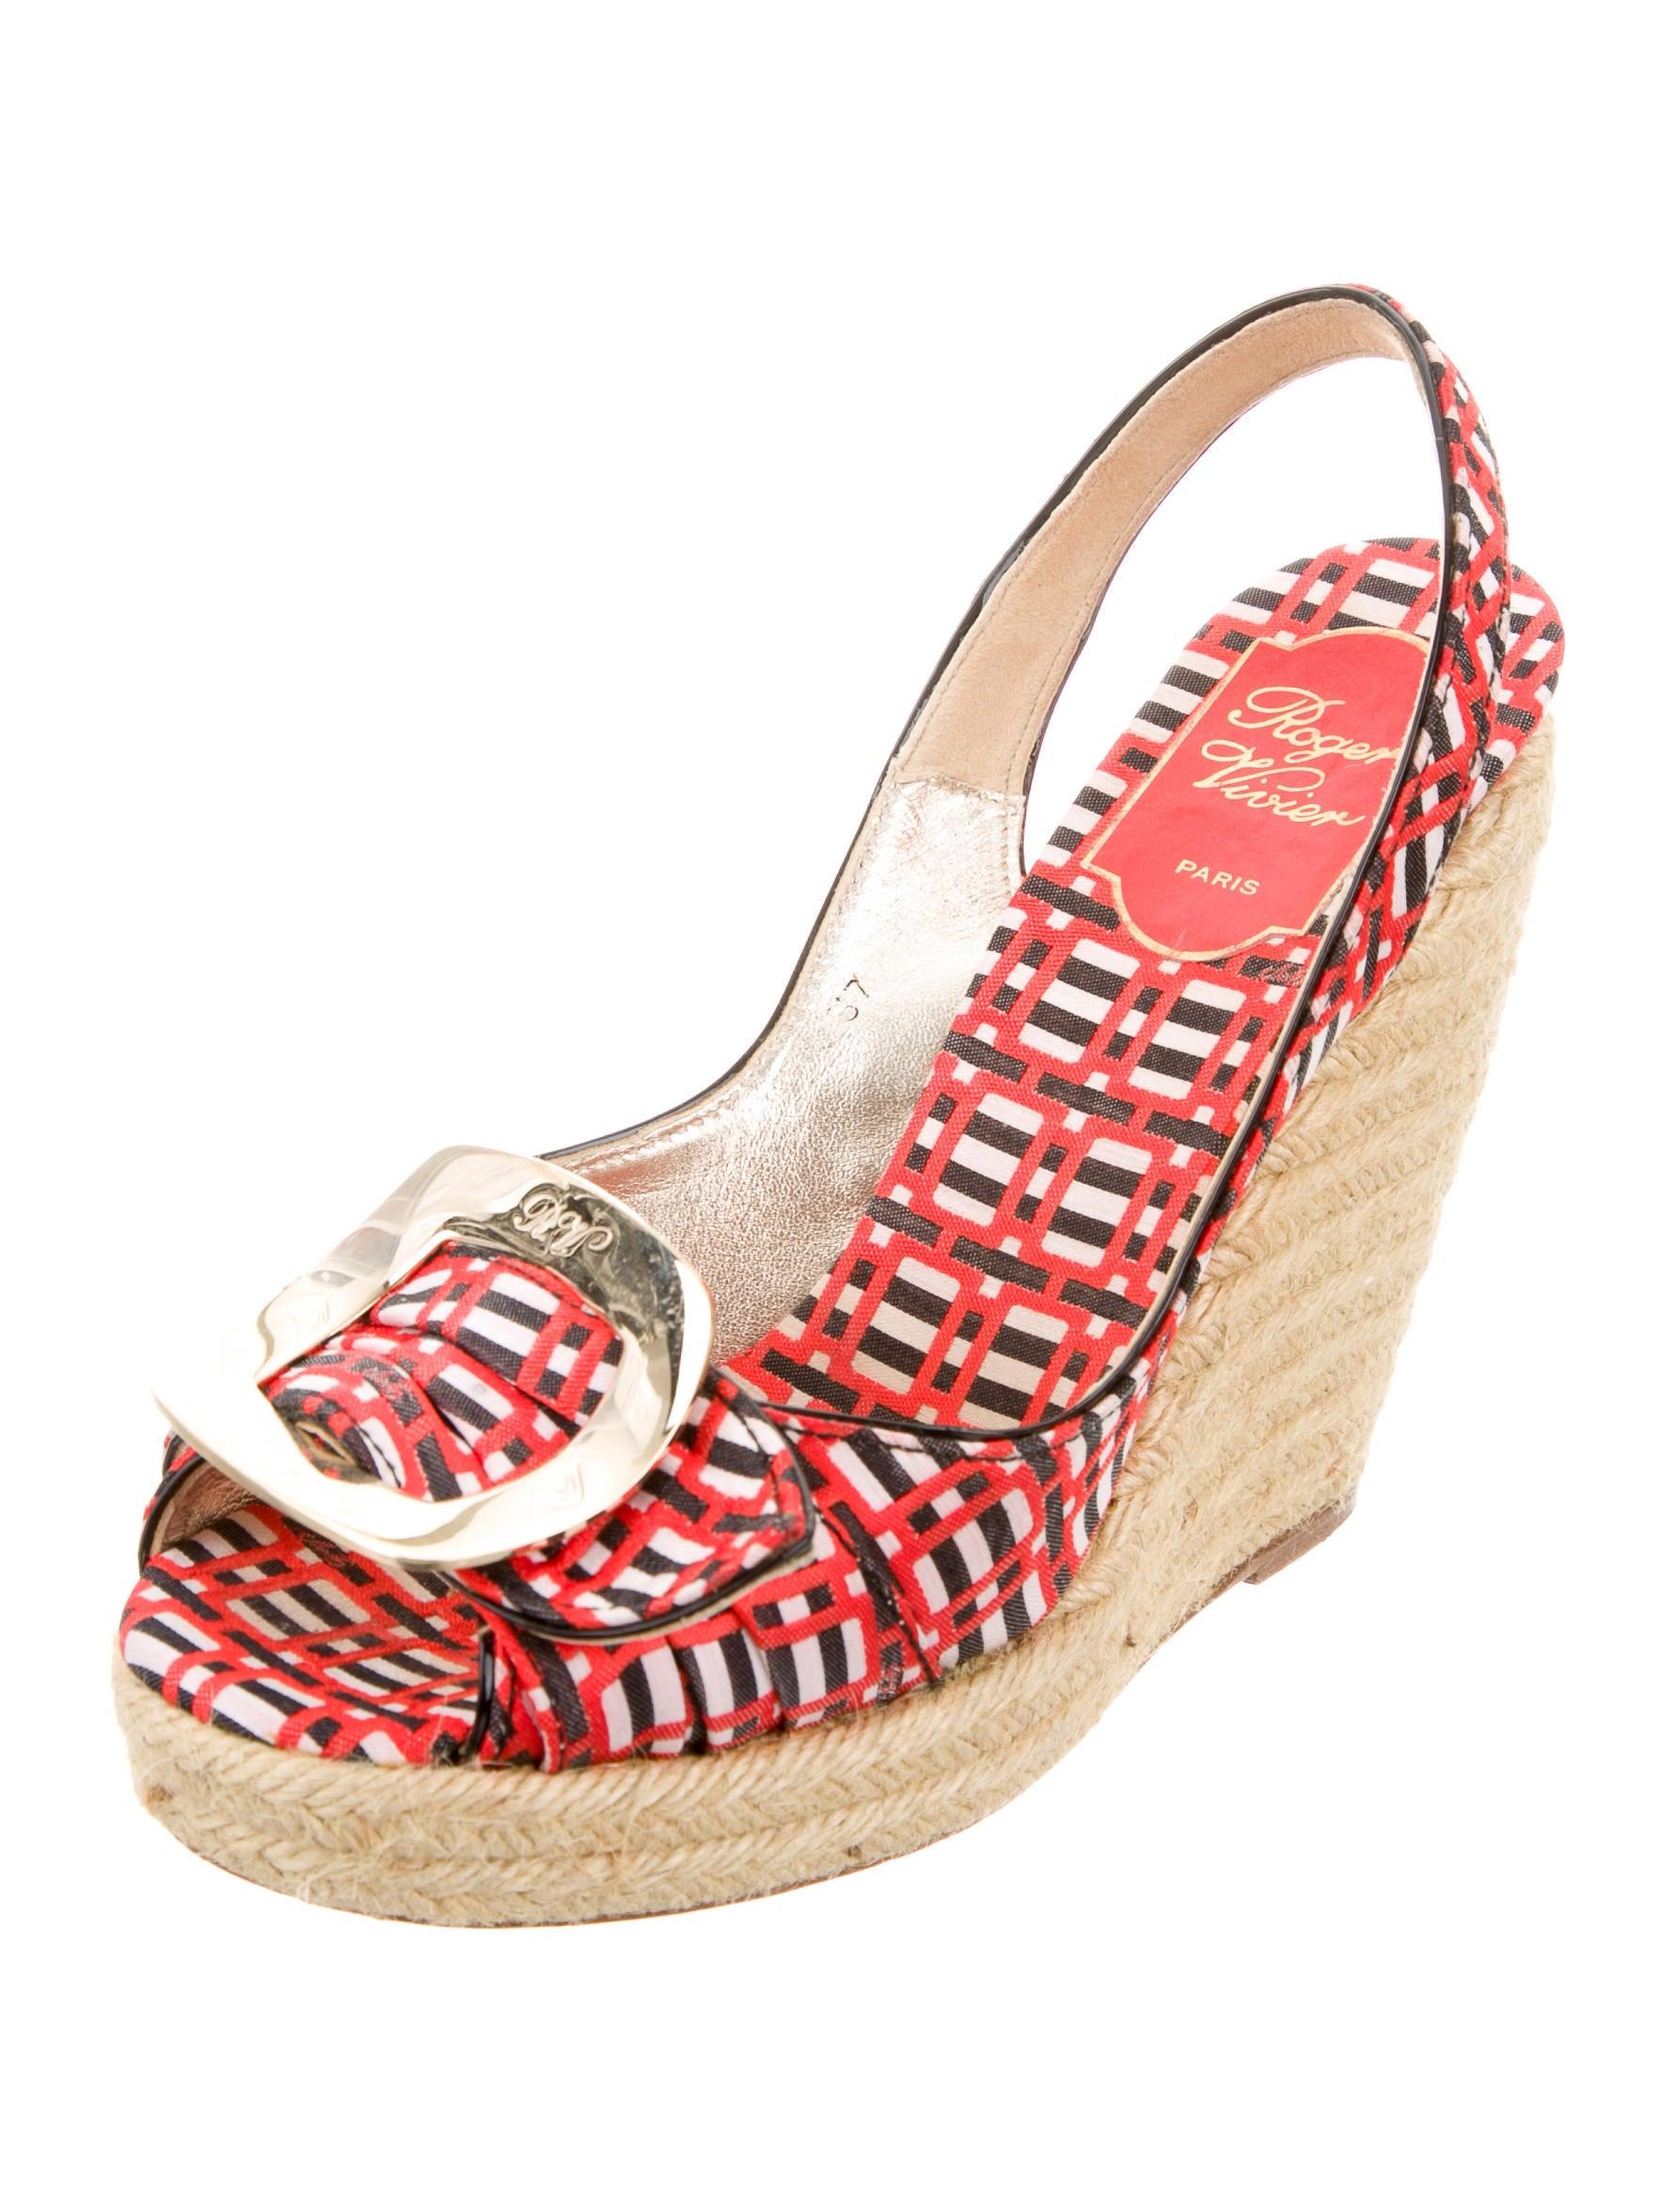 roger vivier espadrille wedge sandals shoes rov25305